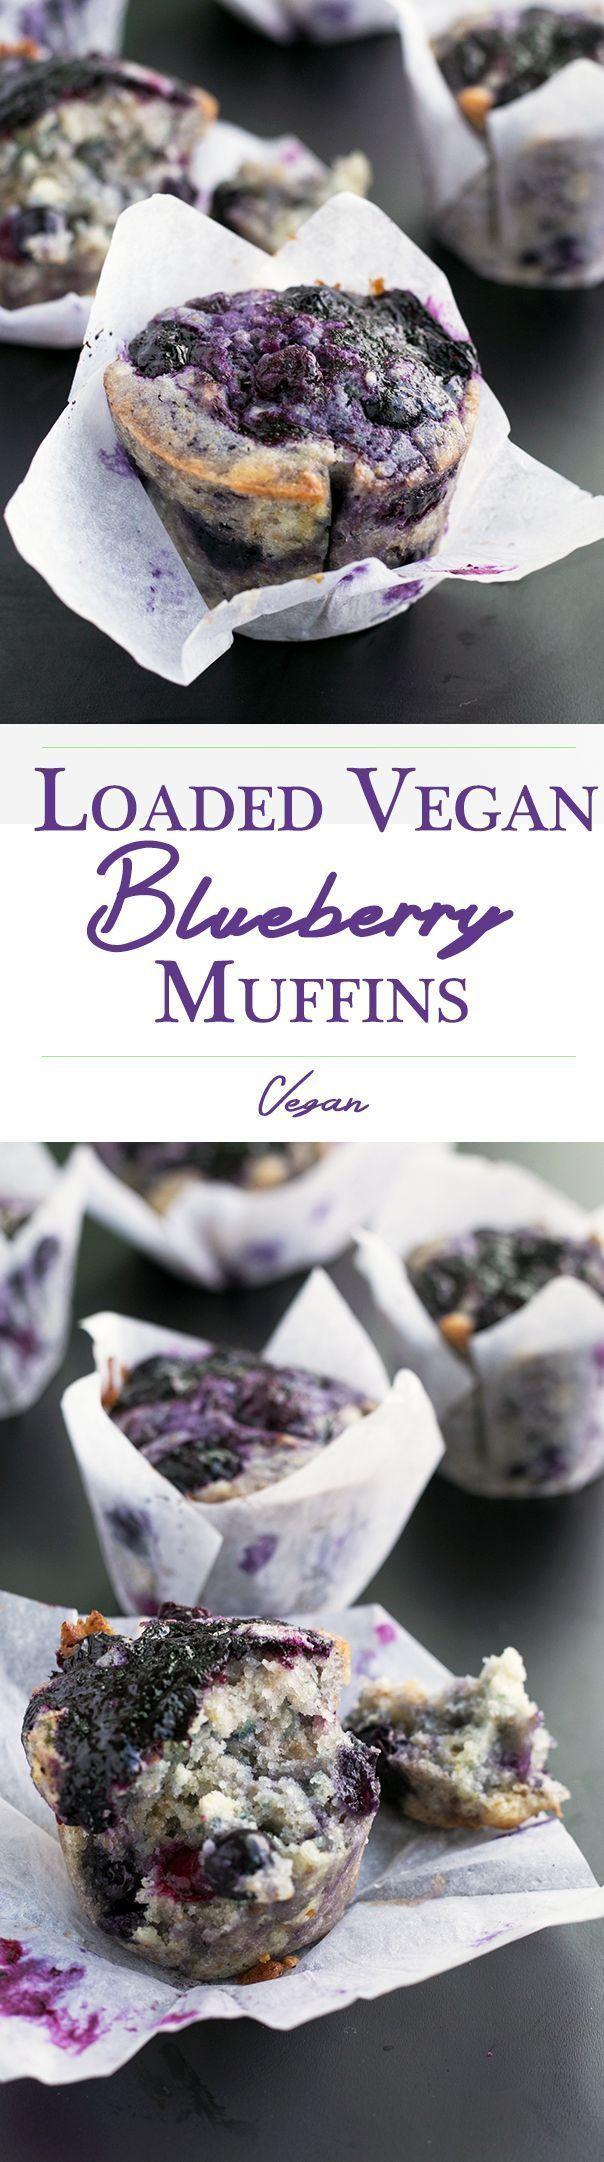 Delicious, fully loaded Vegan Blueberry Muffins. ~ vegan recipe, breakfast| healthy recipe ideas